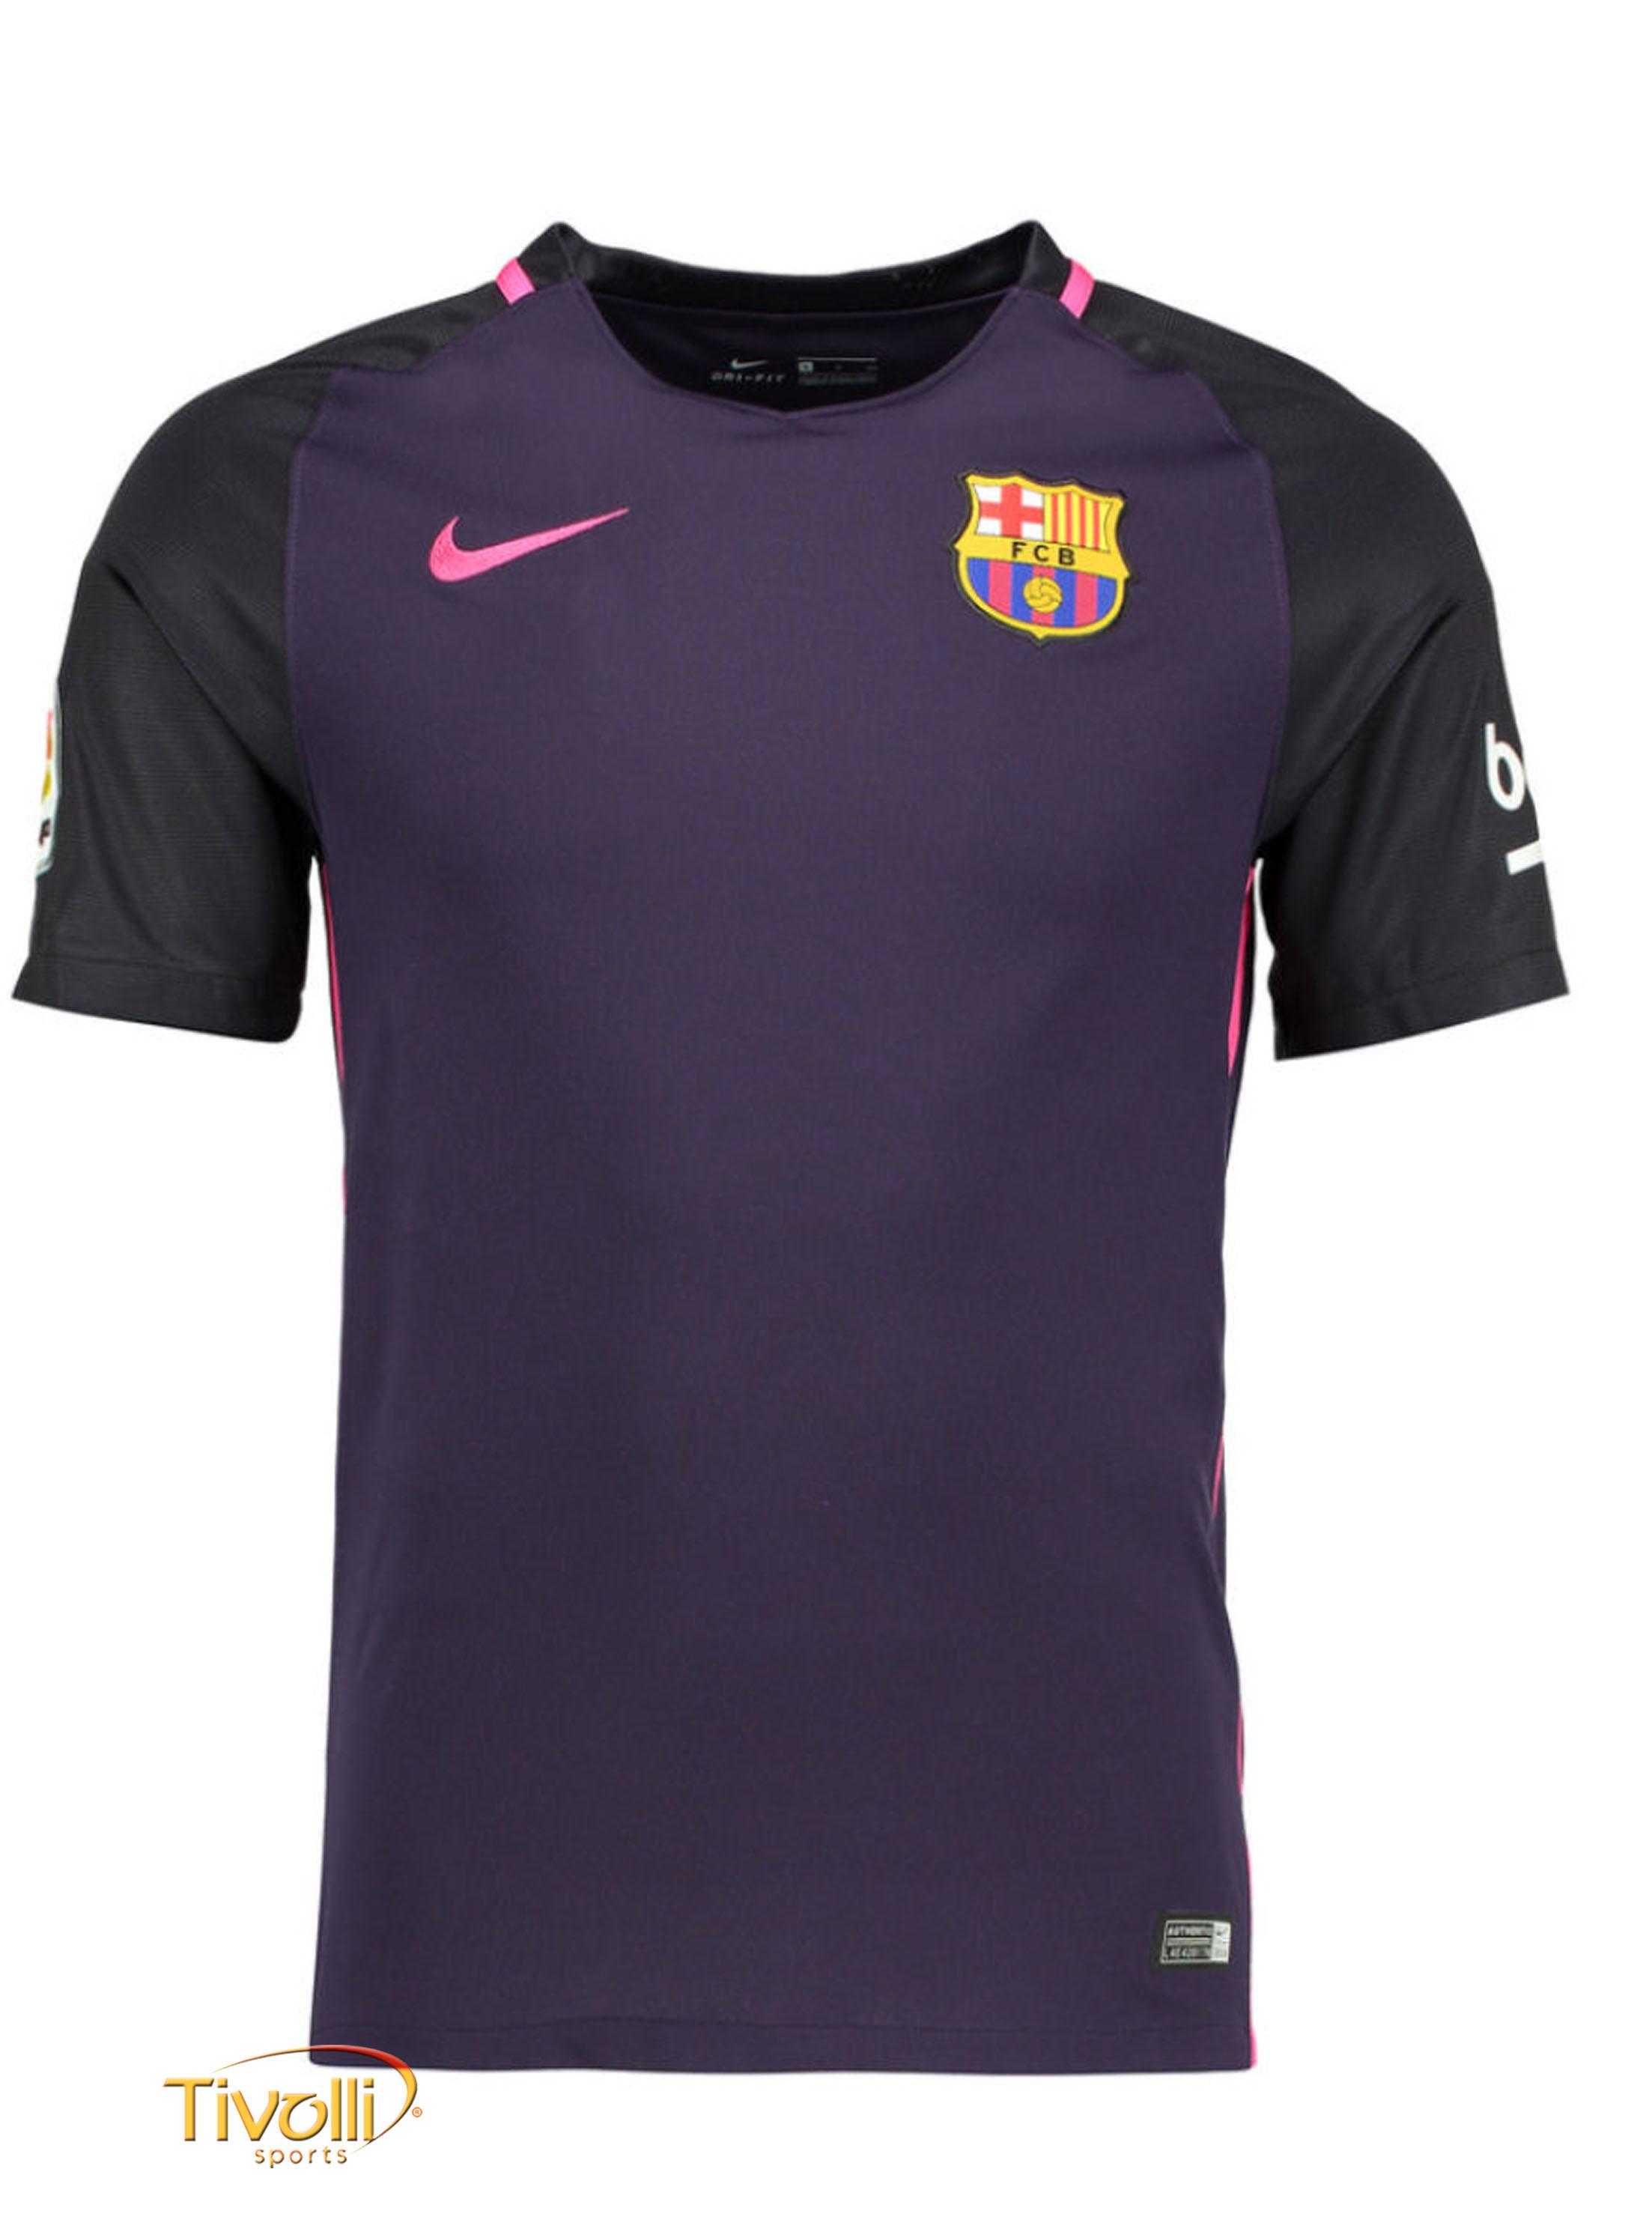 fe40f4e56dbb6 Camisa FC Barcelona II Away Nike 2016 17 Infantil   - Mega Saldão